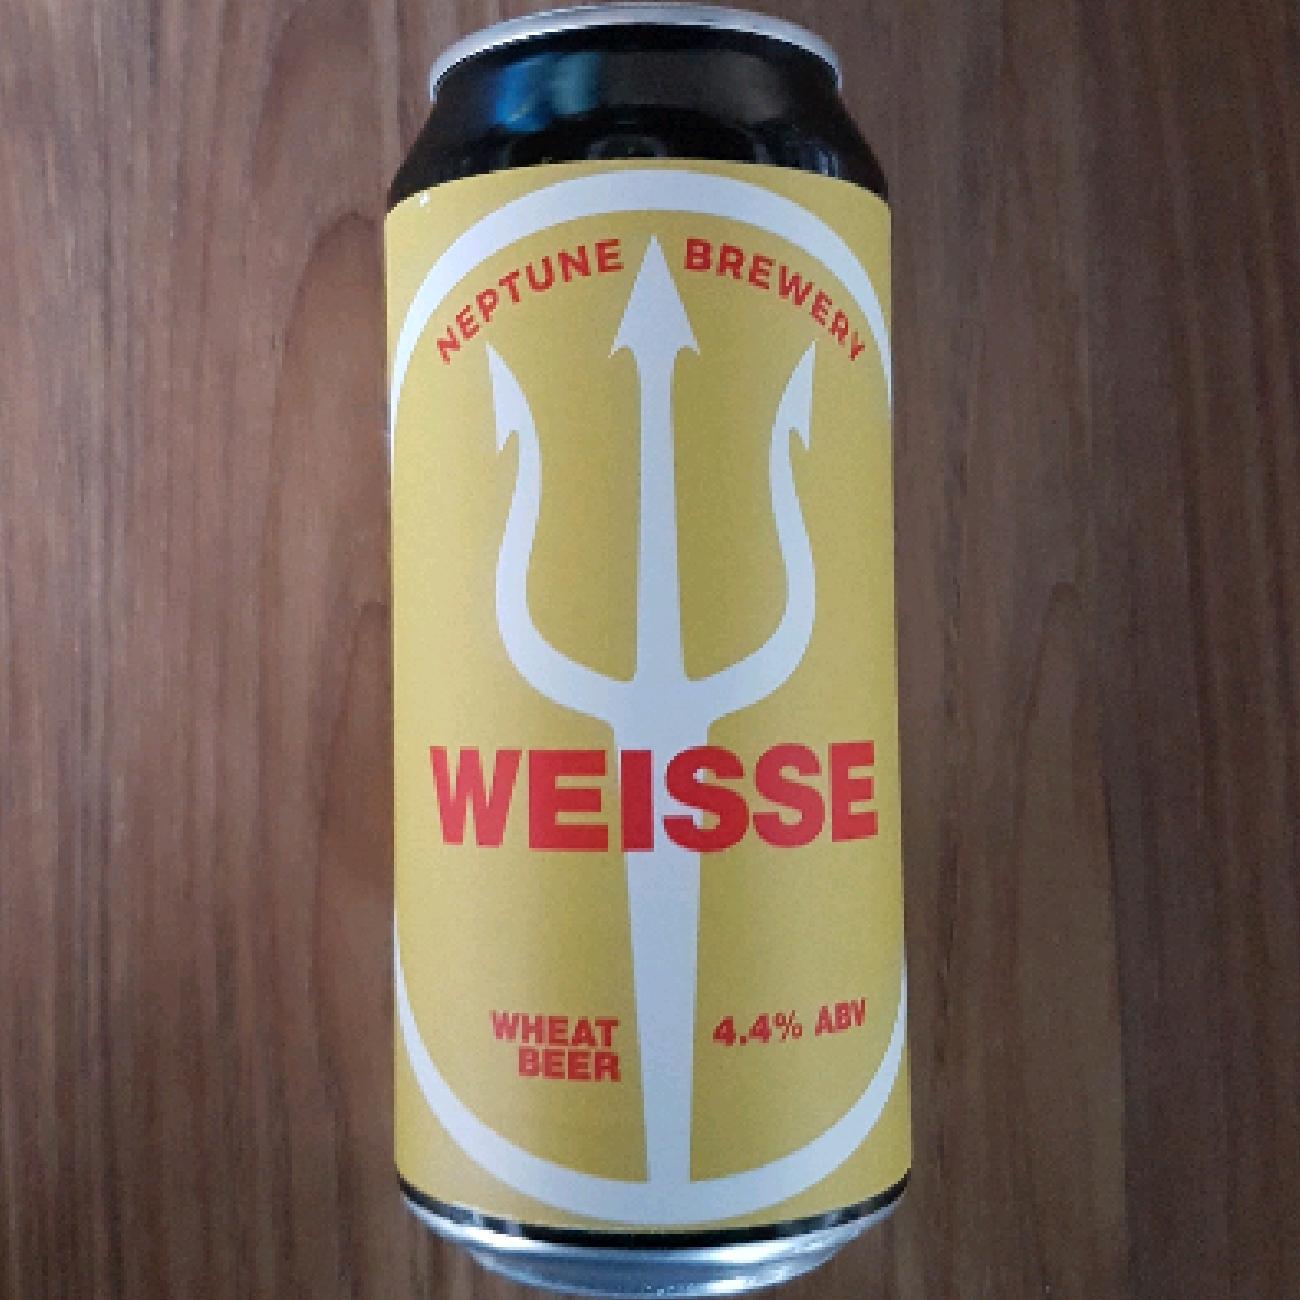 Neptune Weisse